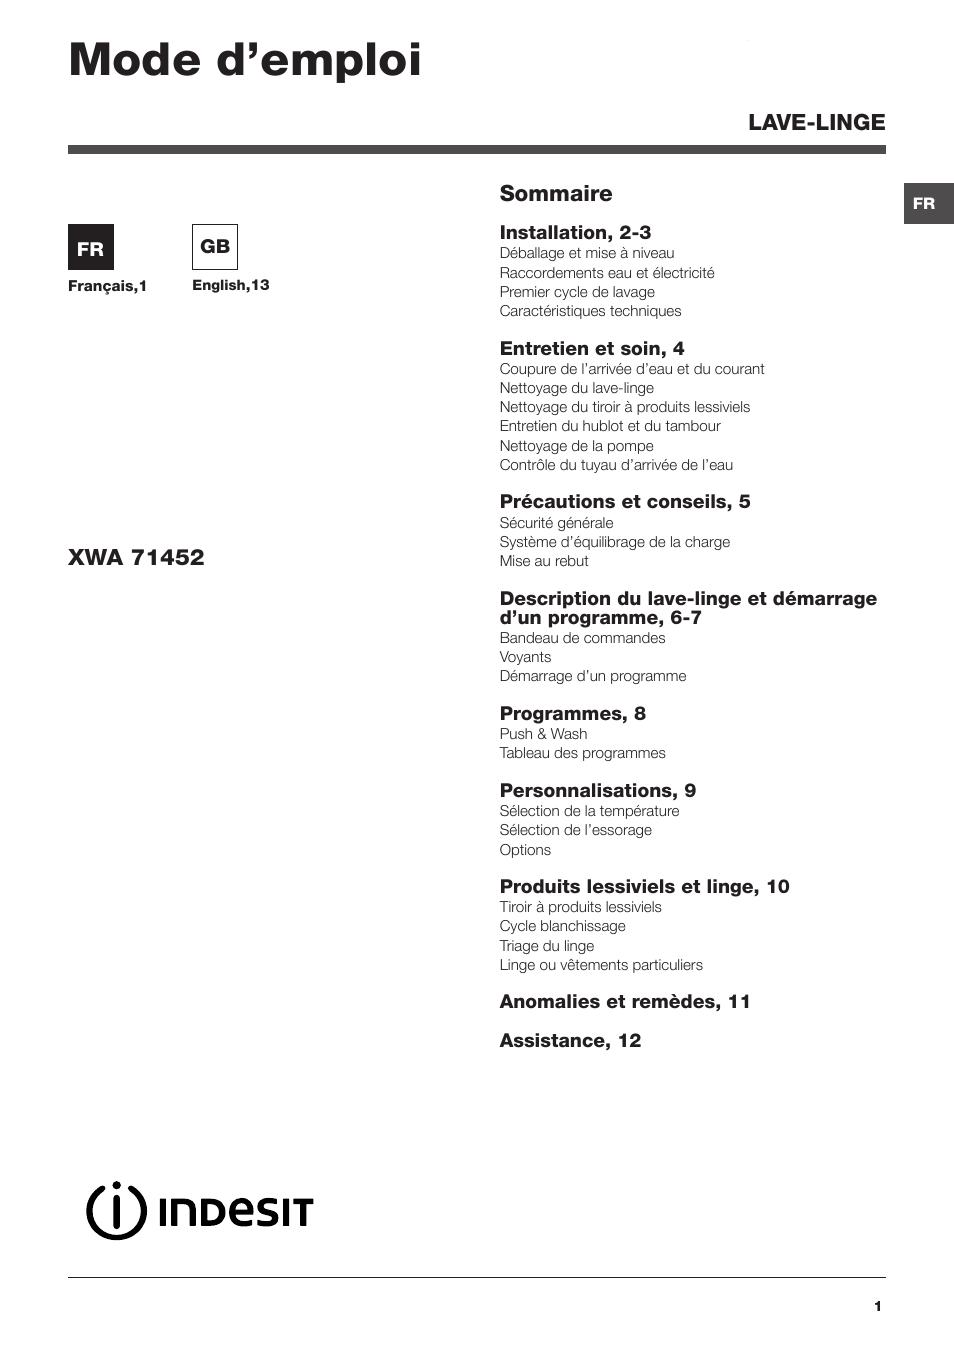 Indesit xwa 71452 w fr manuel d 39 utilisation pages 24 - Cookeo mode d emploi ...